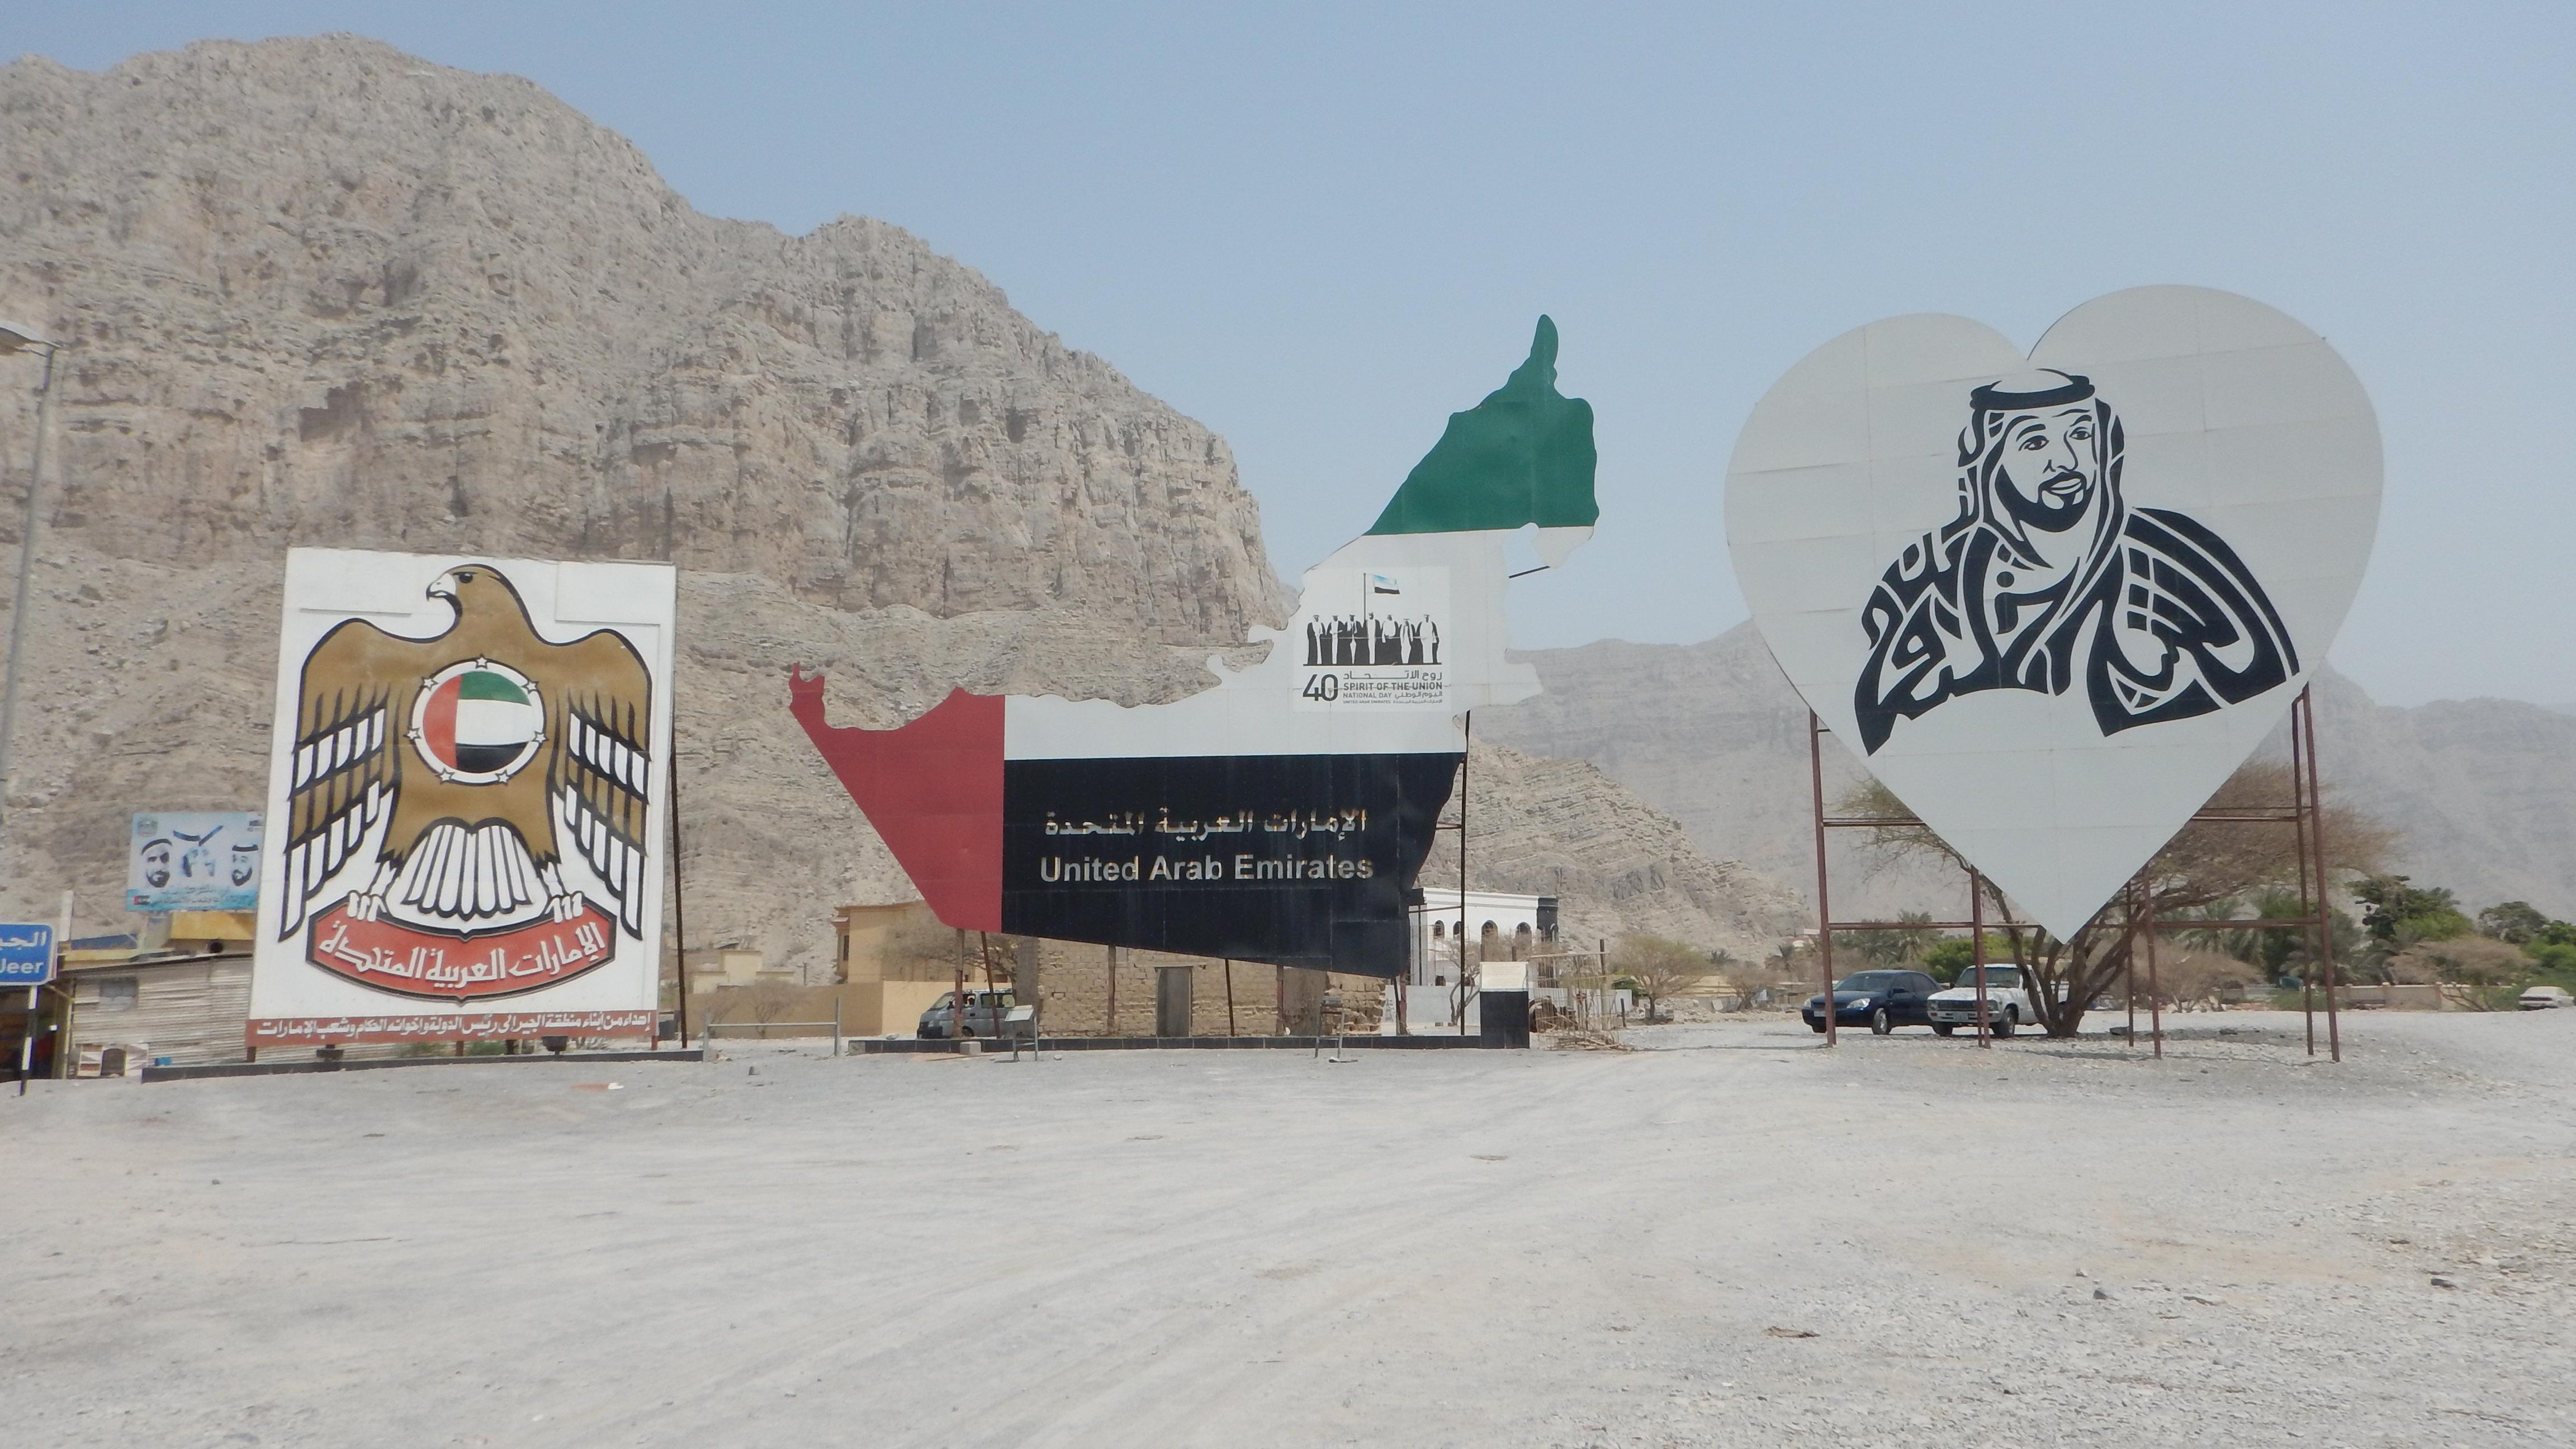 strada_Oman_3